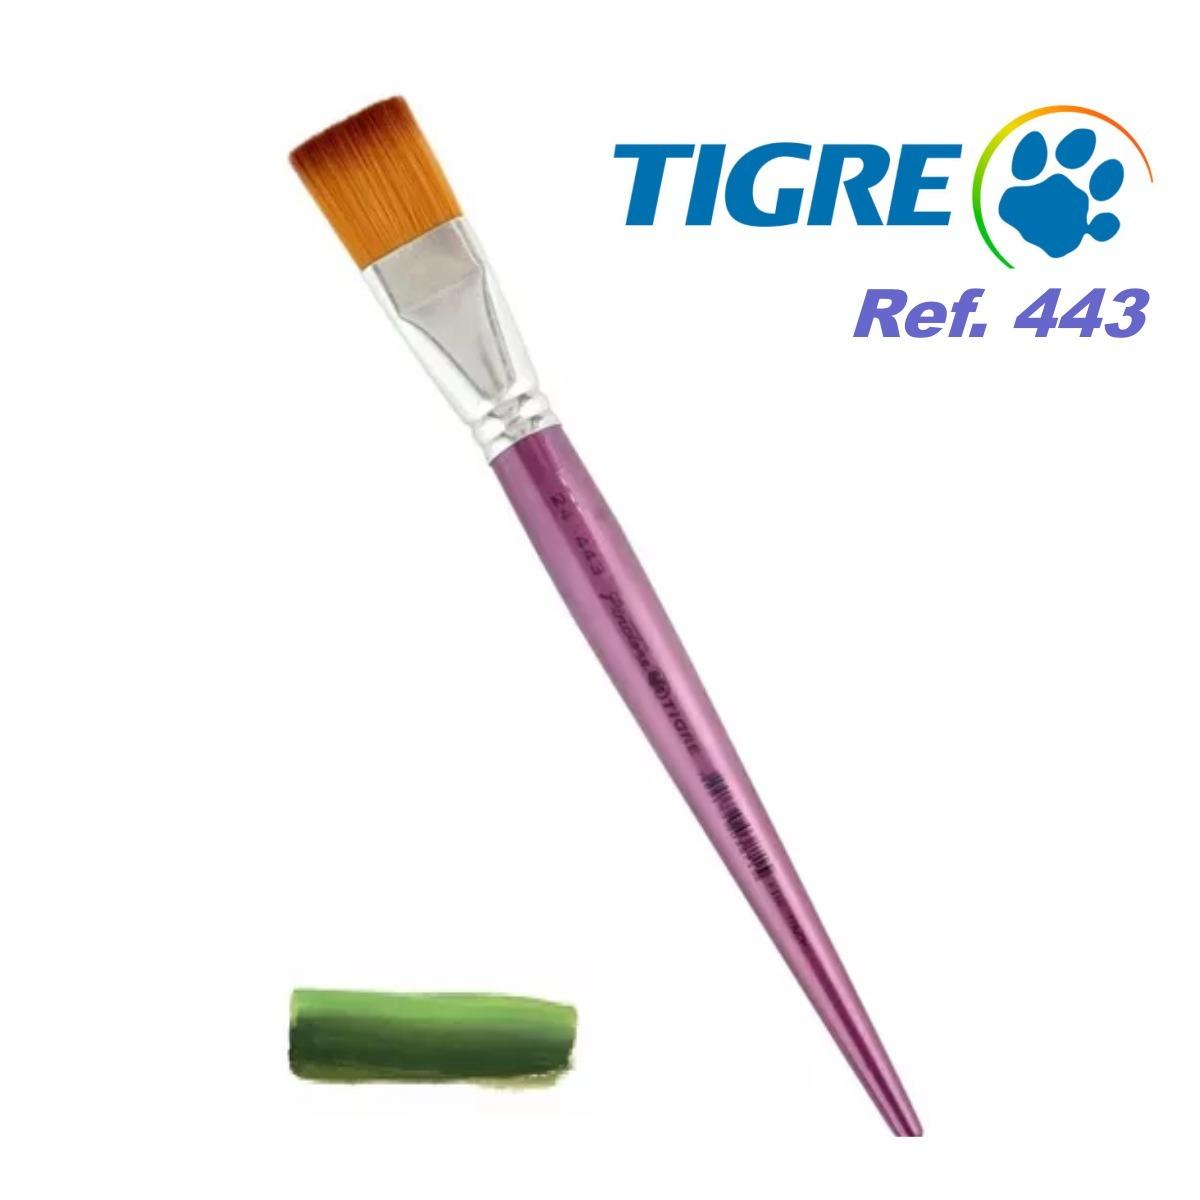 Pincel Chato Pelo Sintético Mesclado Ref. 443 Tigre